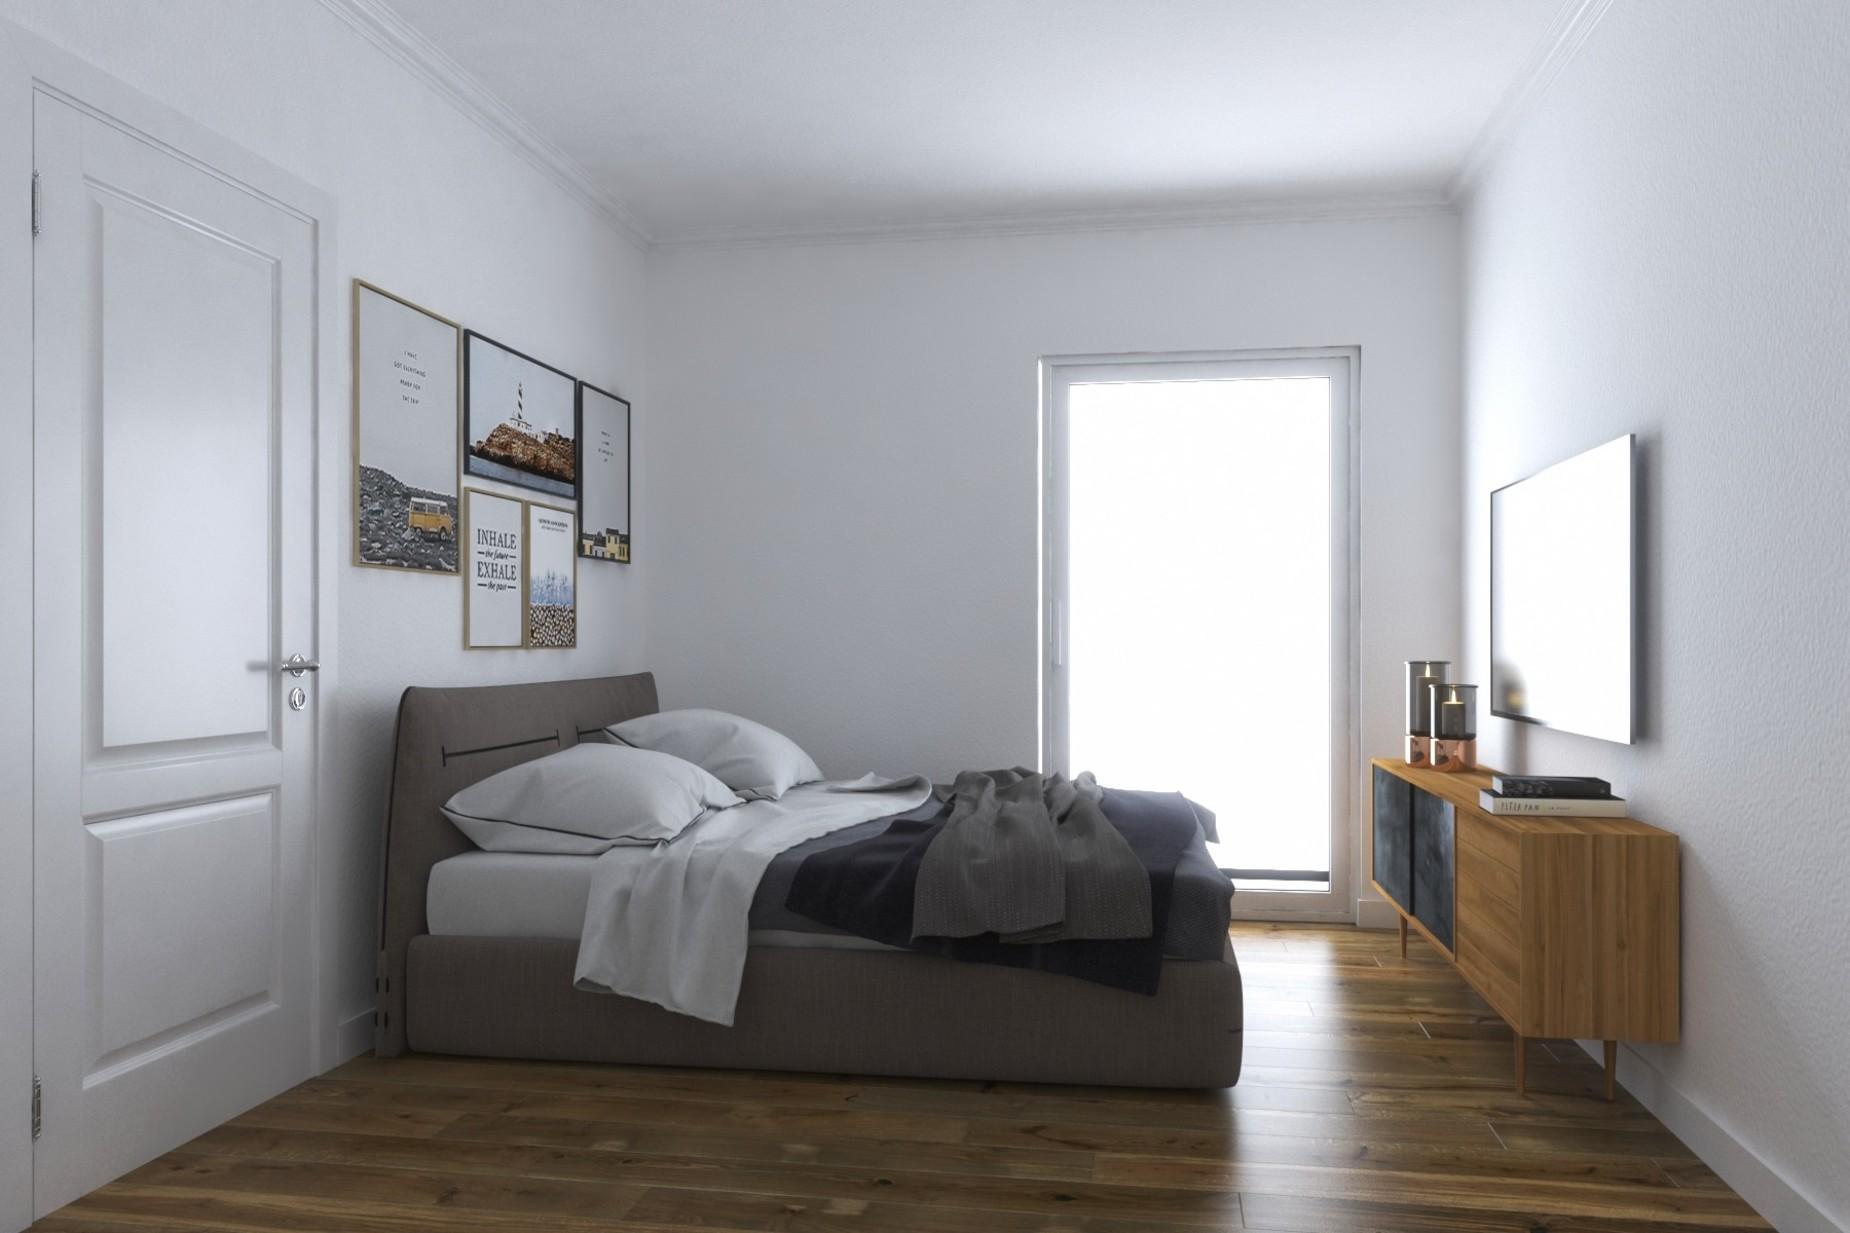 2 bed Penthouse For Sale in Birkirkara, Birkirkara - thumb 5